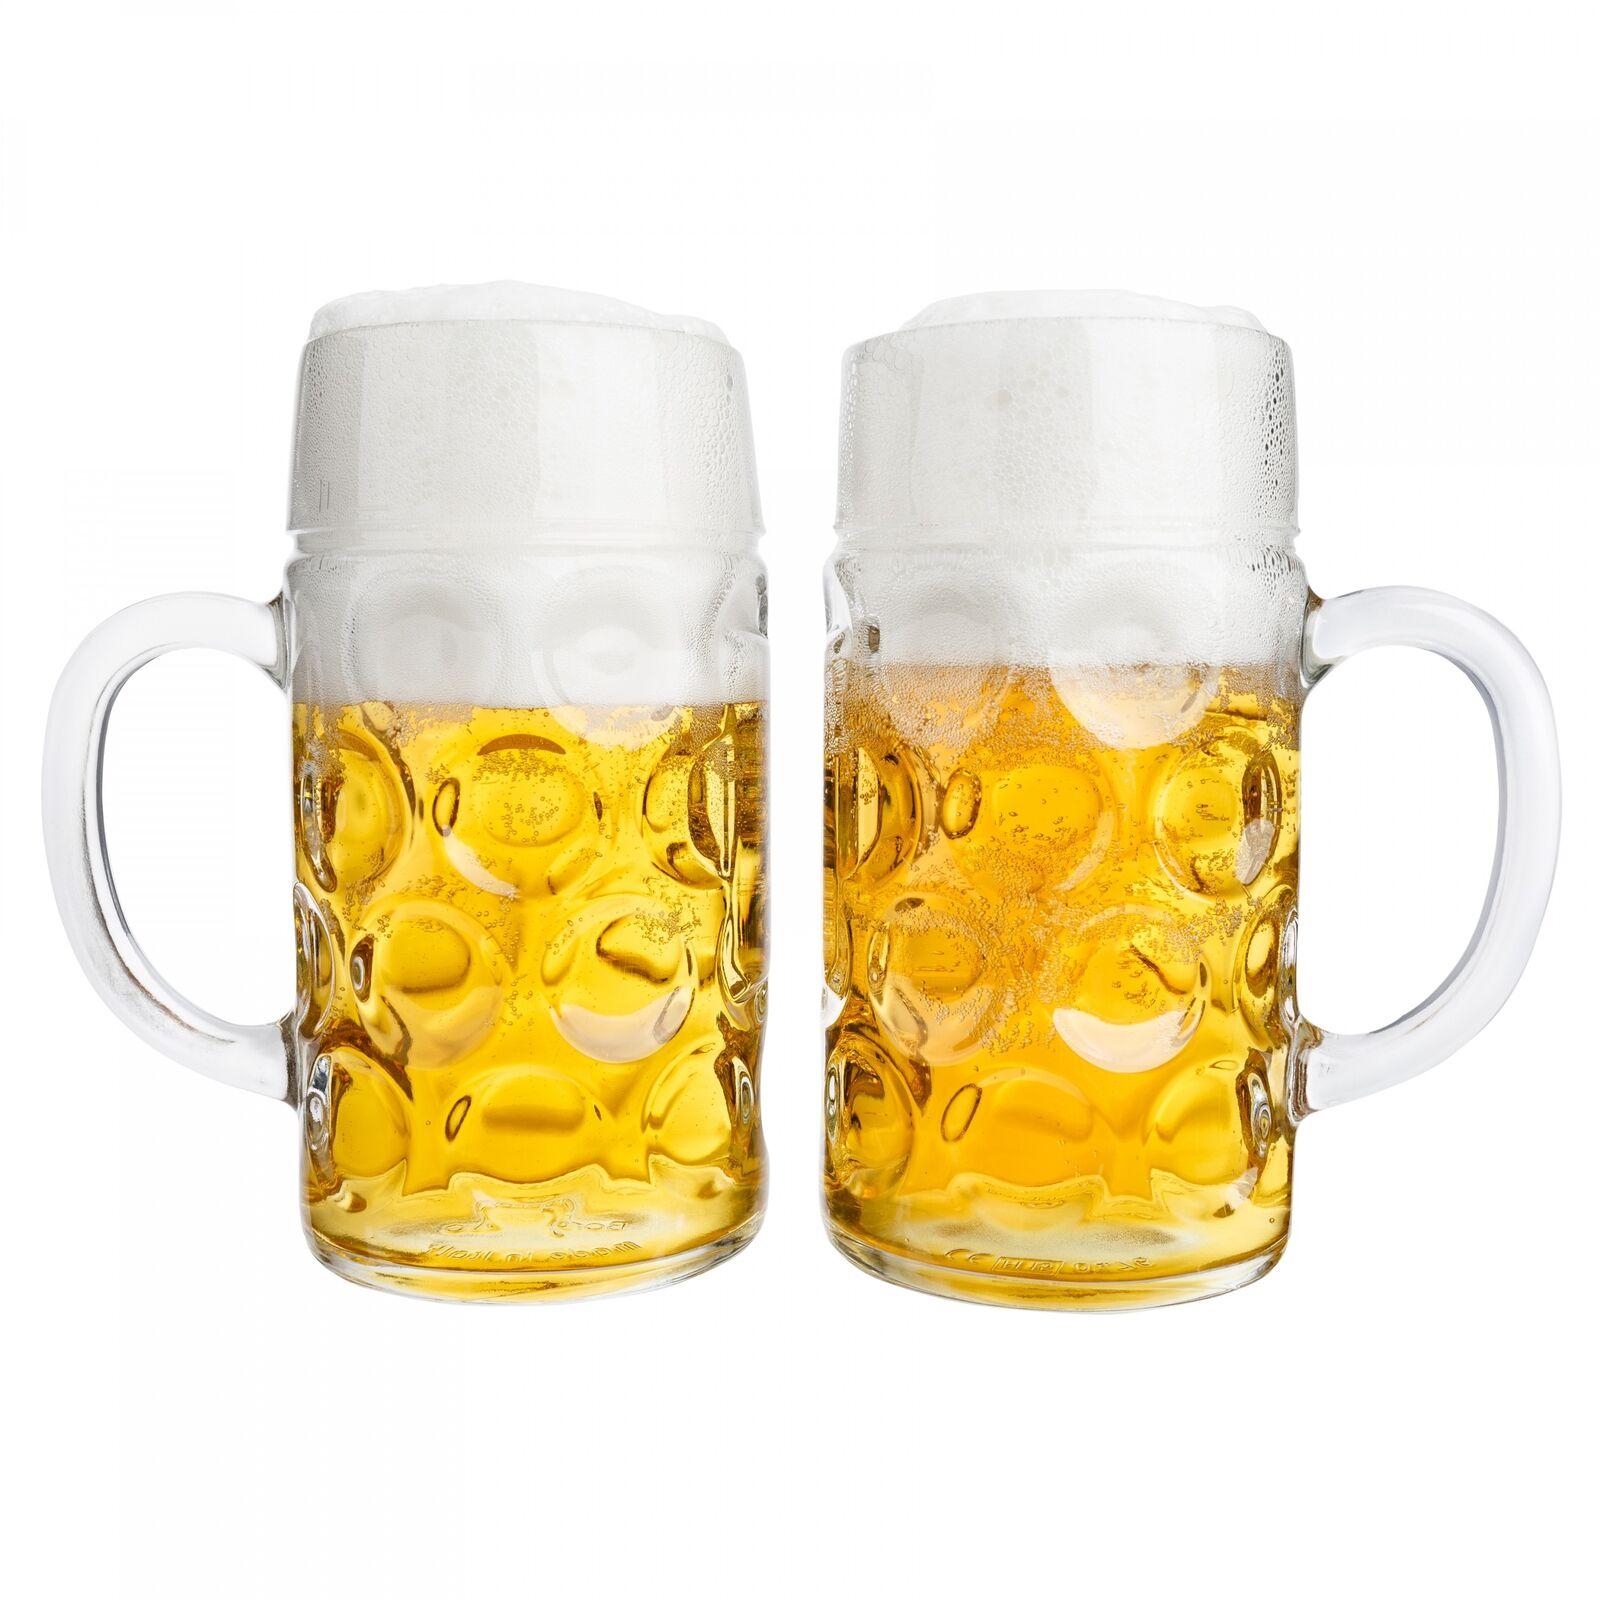 2er Set Maßkrug 1 L geeicht Bierkrug Glas Bierglas Glaskrug Maß Bier Maßkrüge